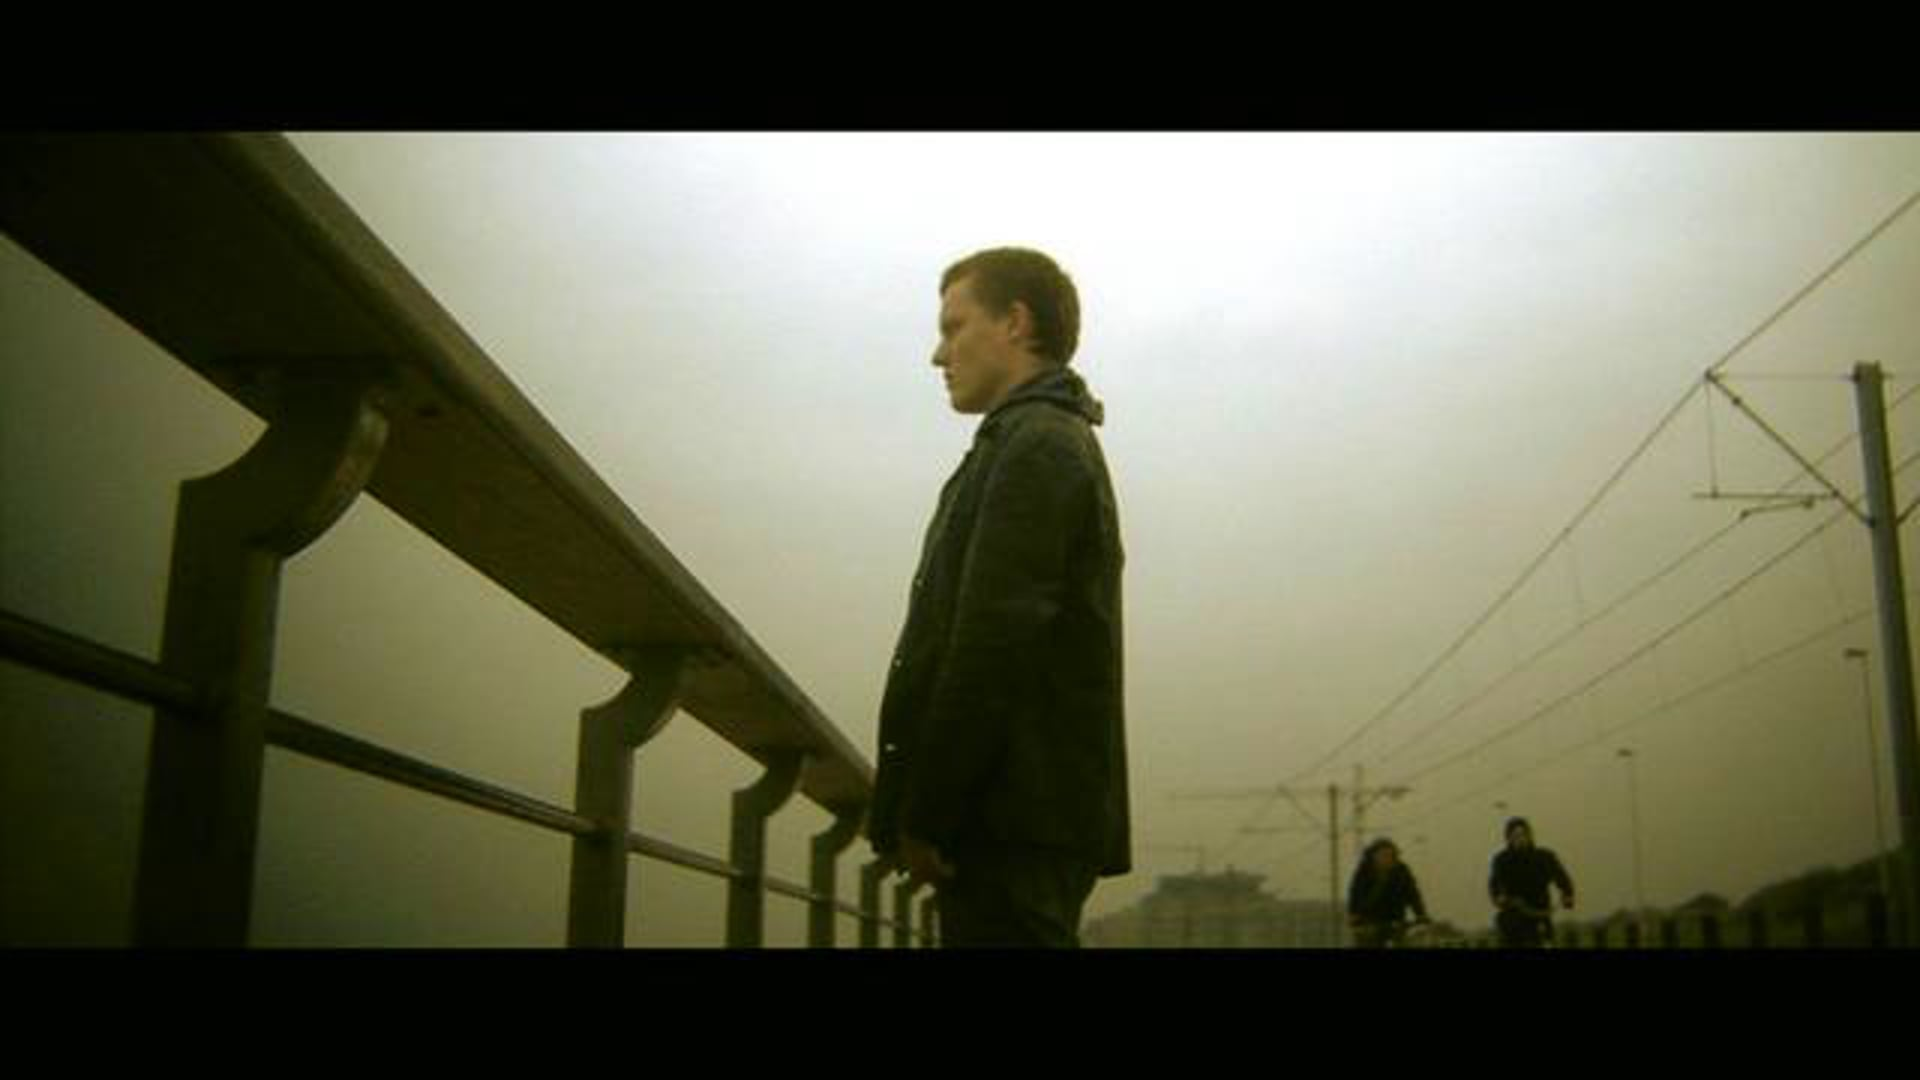 Frank Shinobi: An Experimental Musical Movie